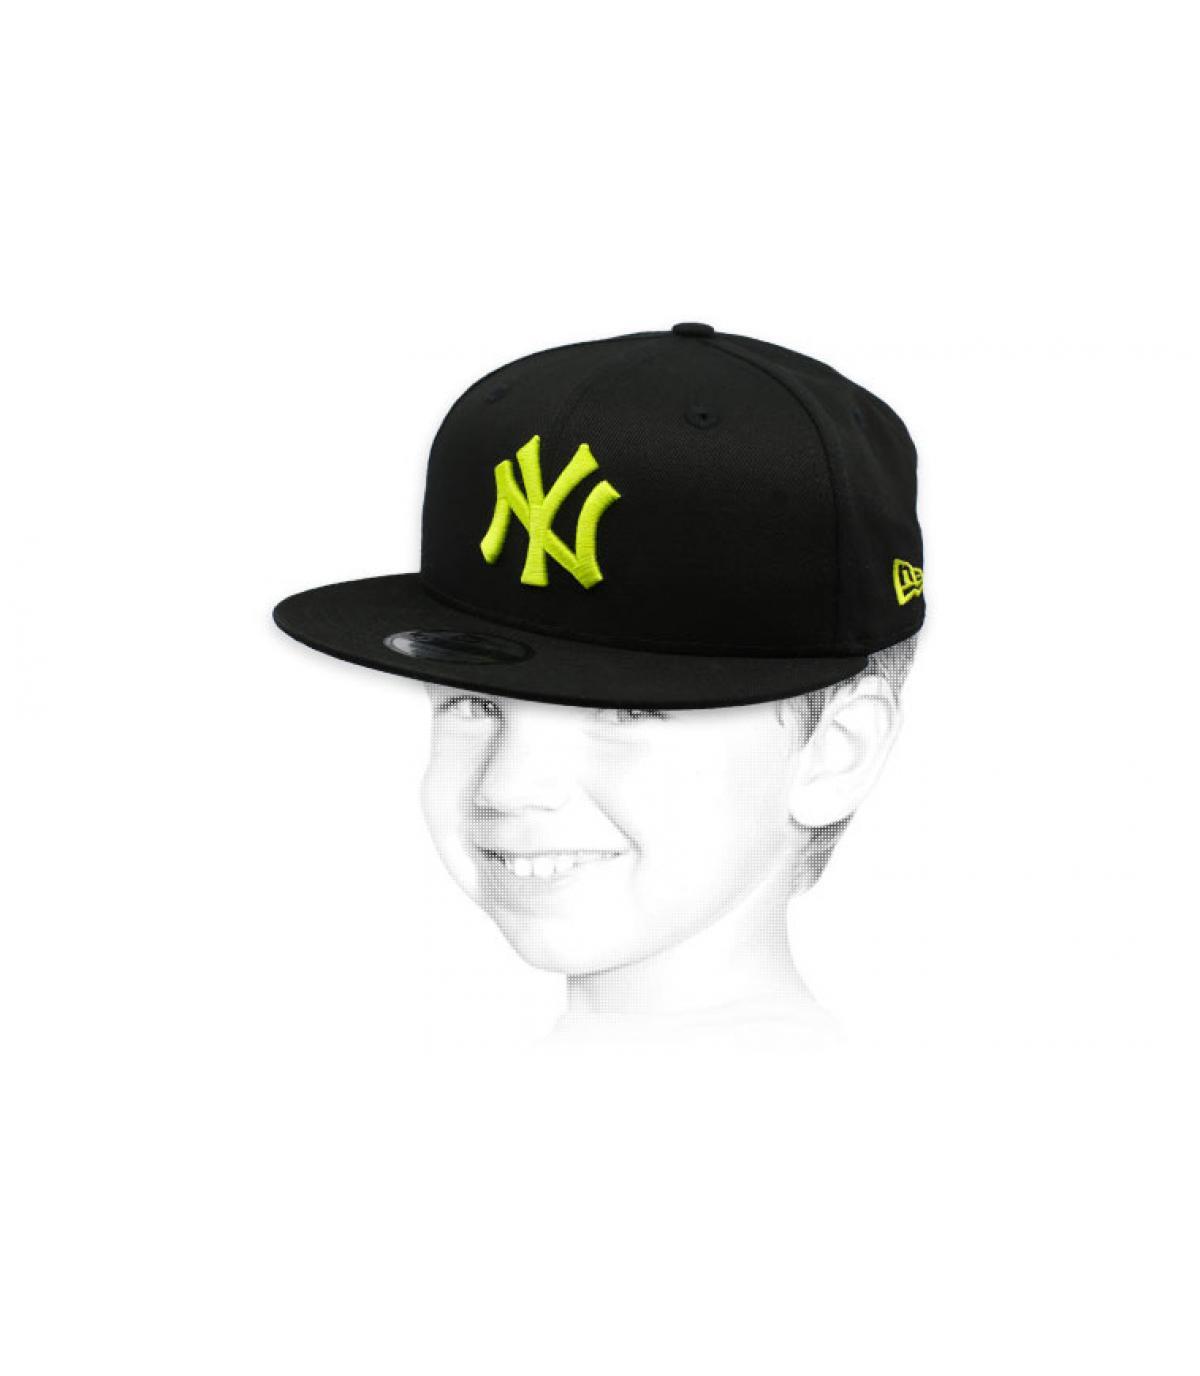 gorra infantil NY negro amarillo